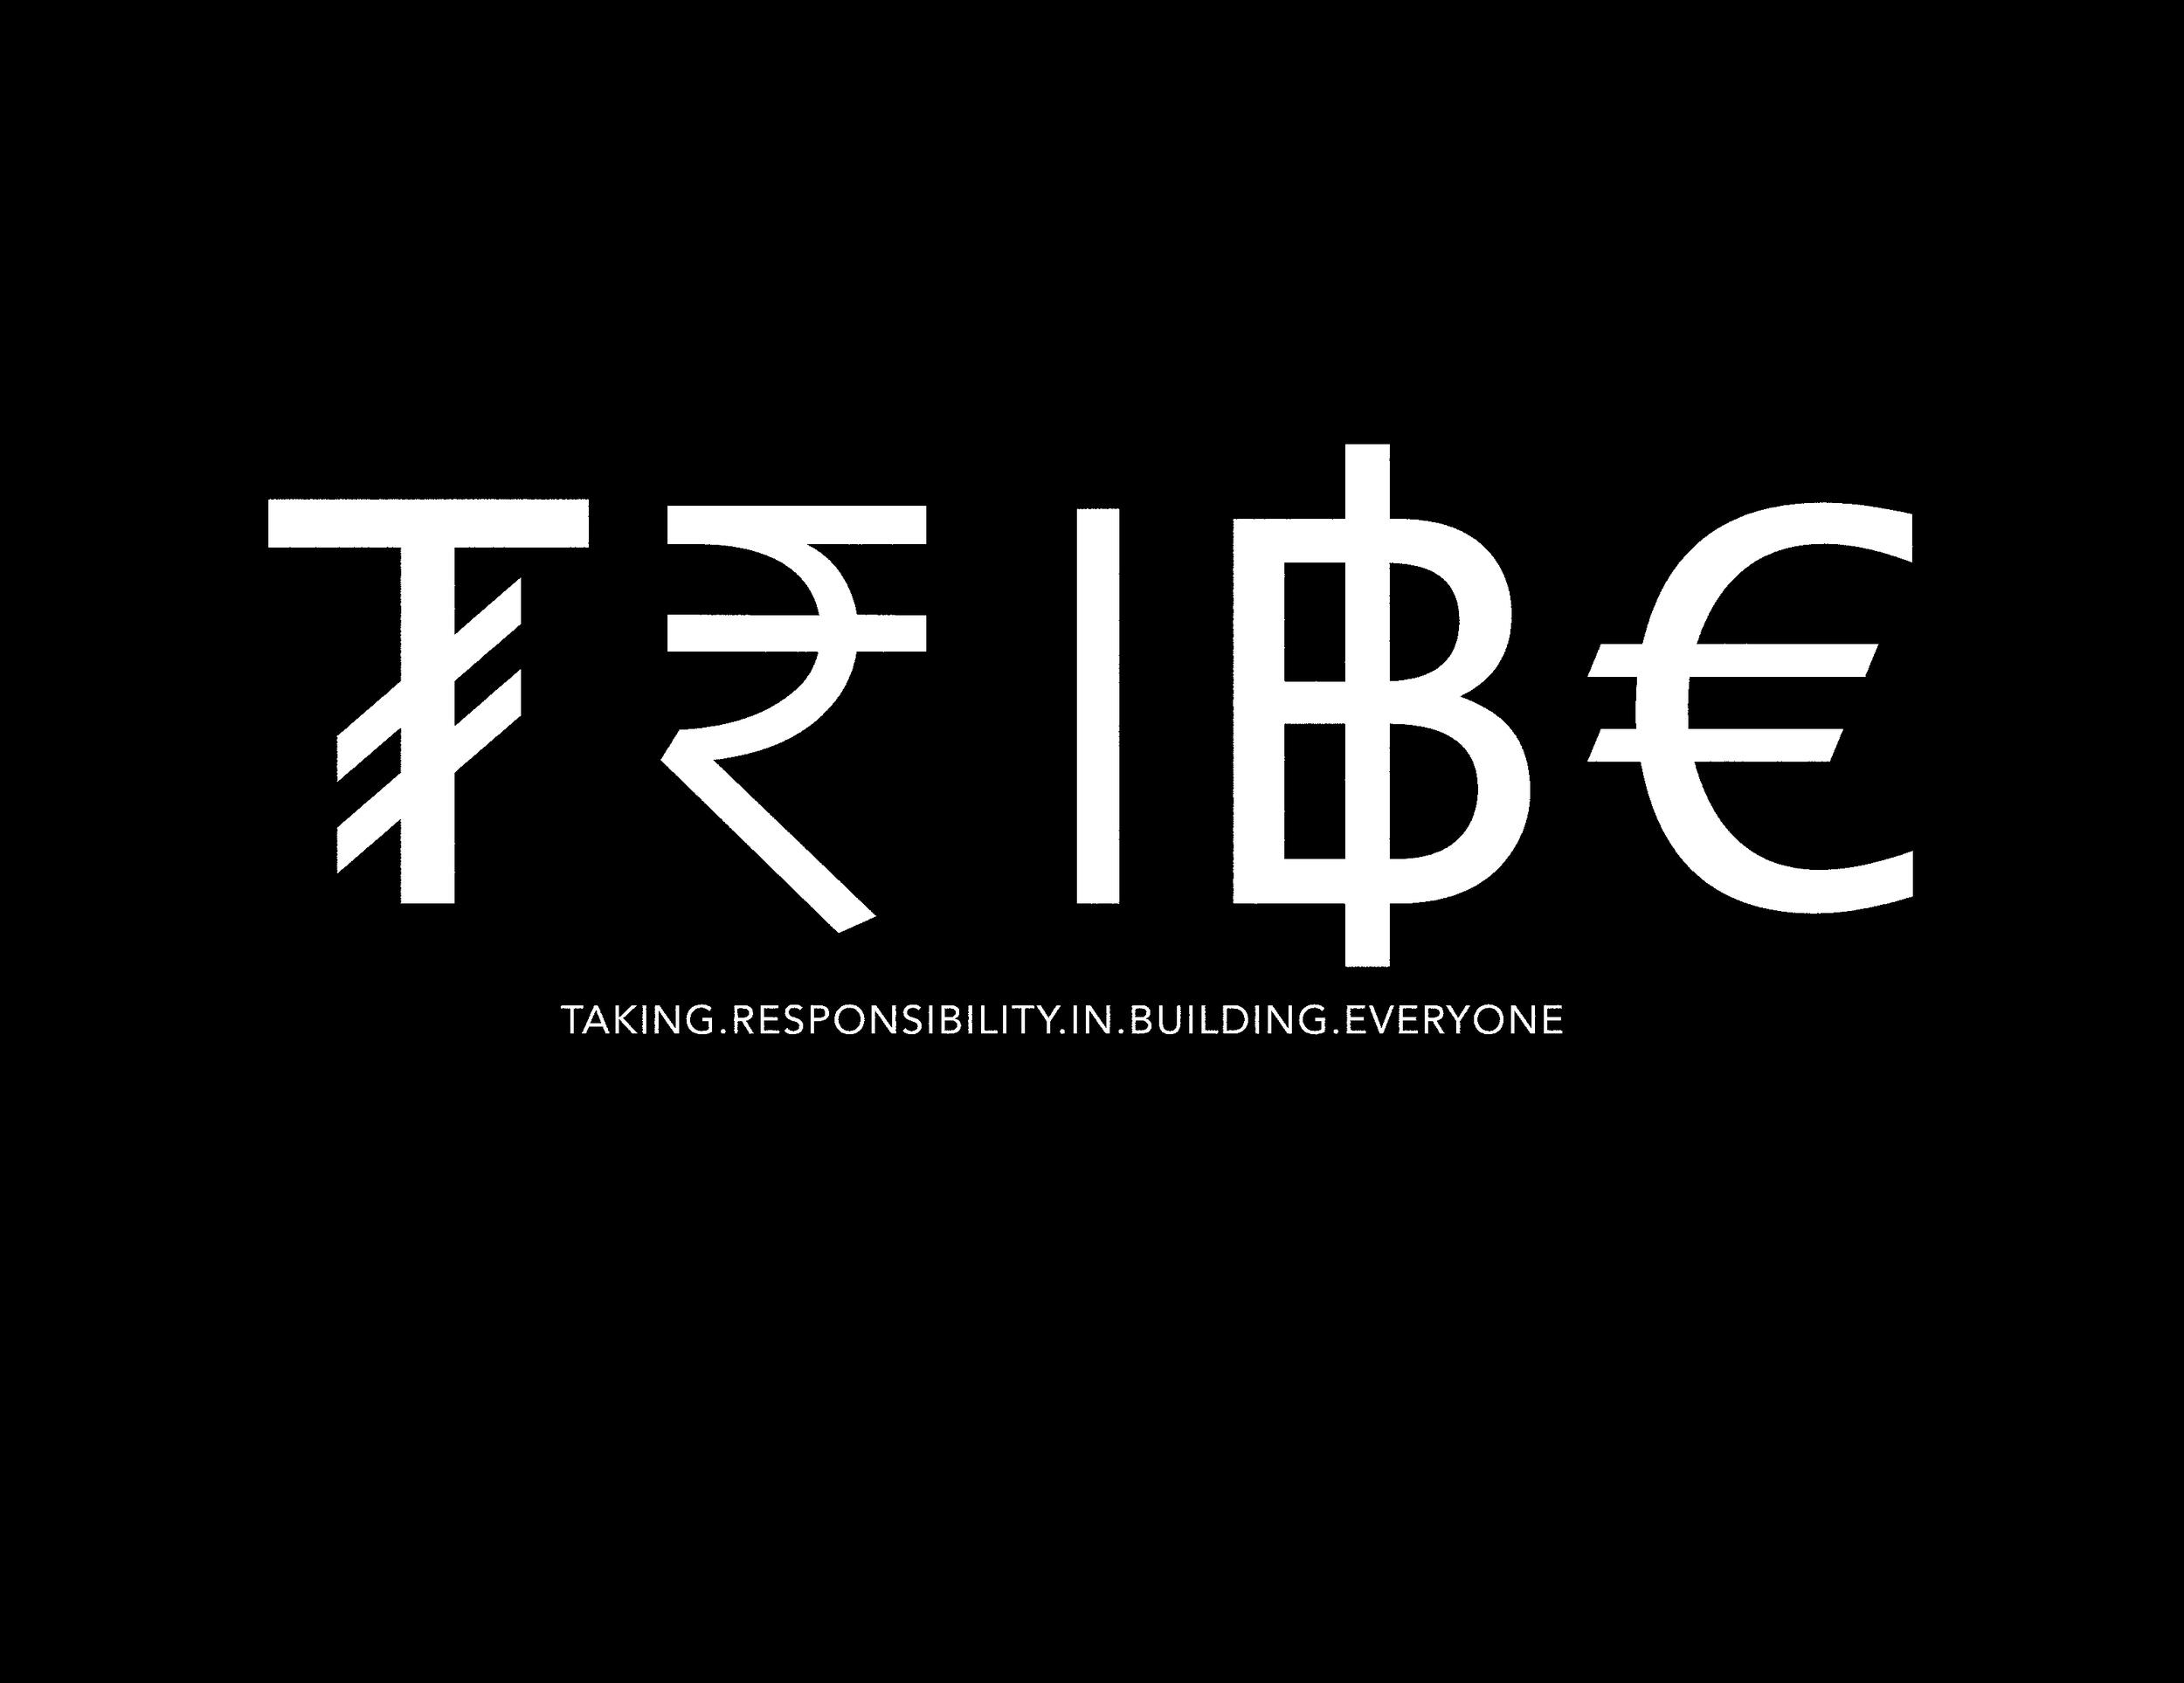 tribe website enterbw.jpg